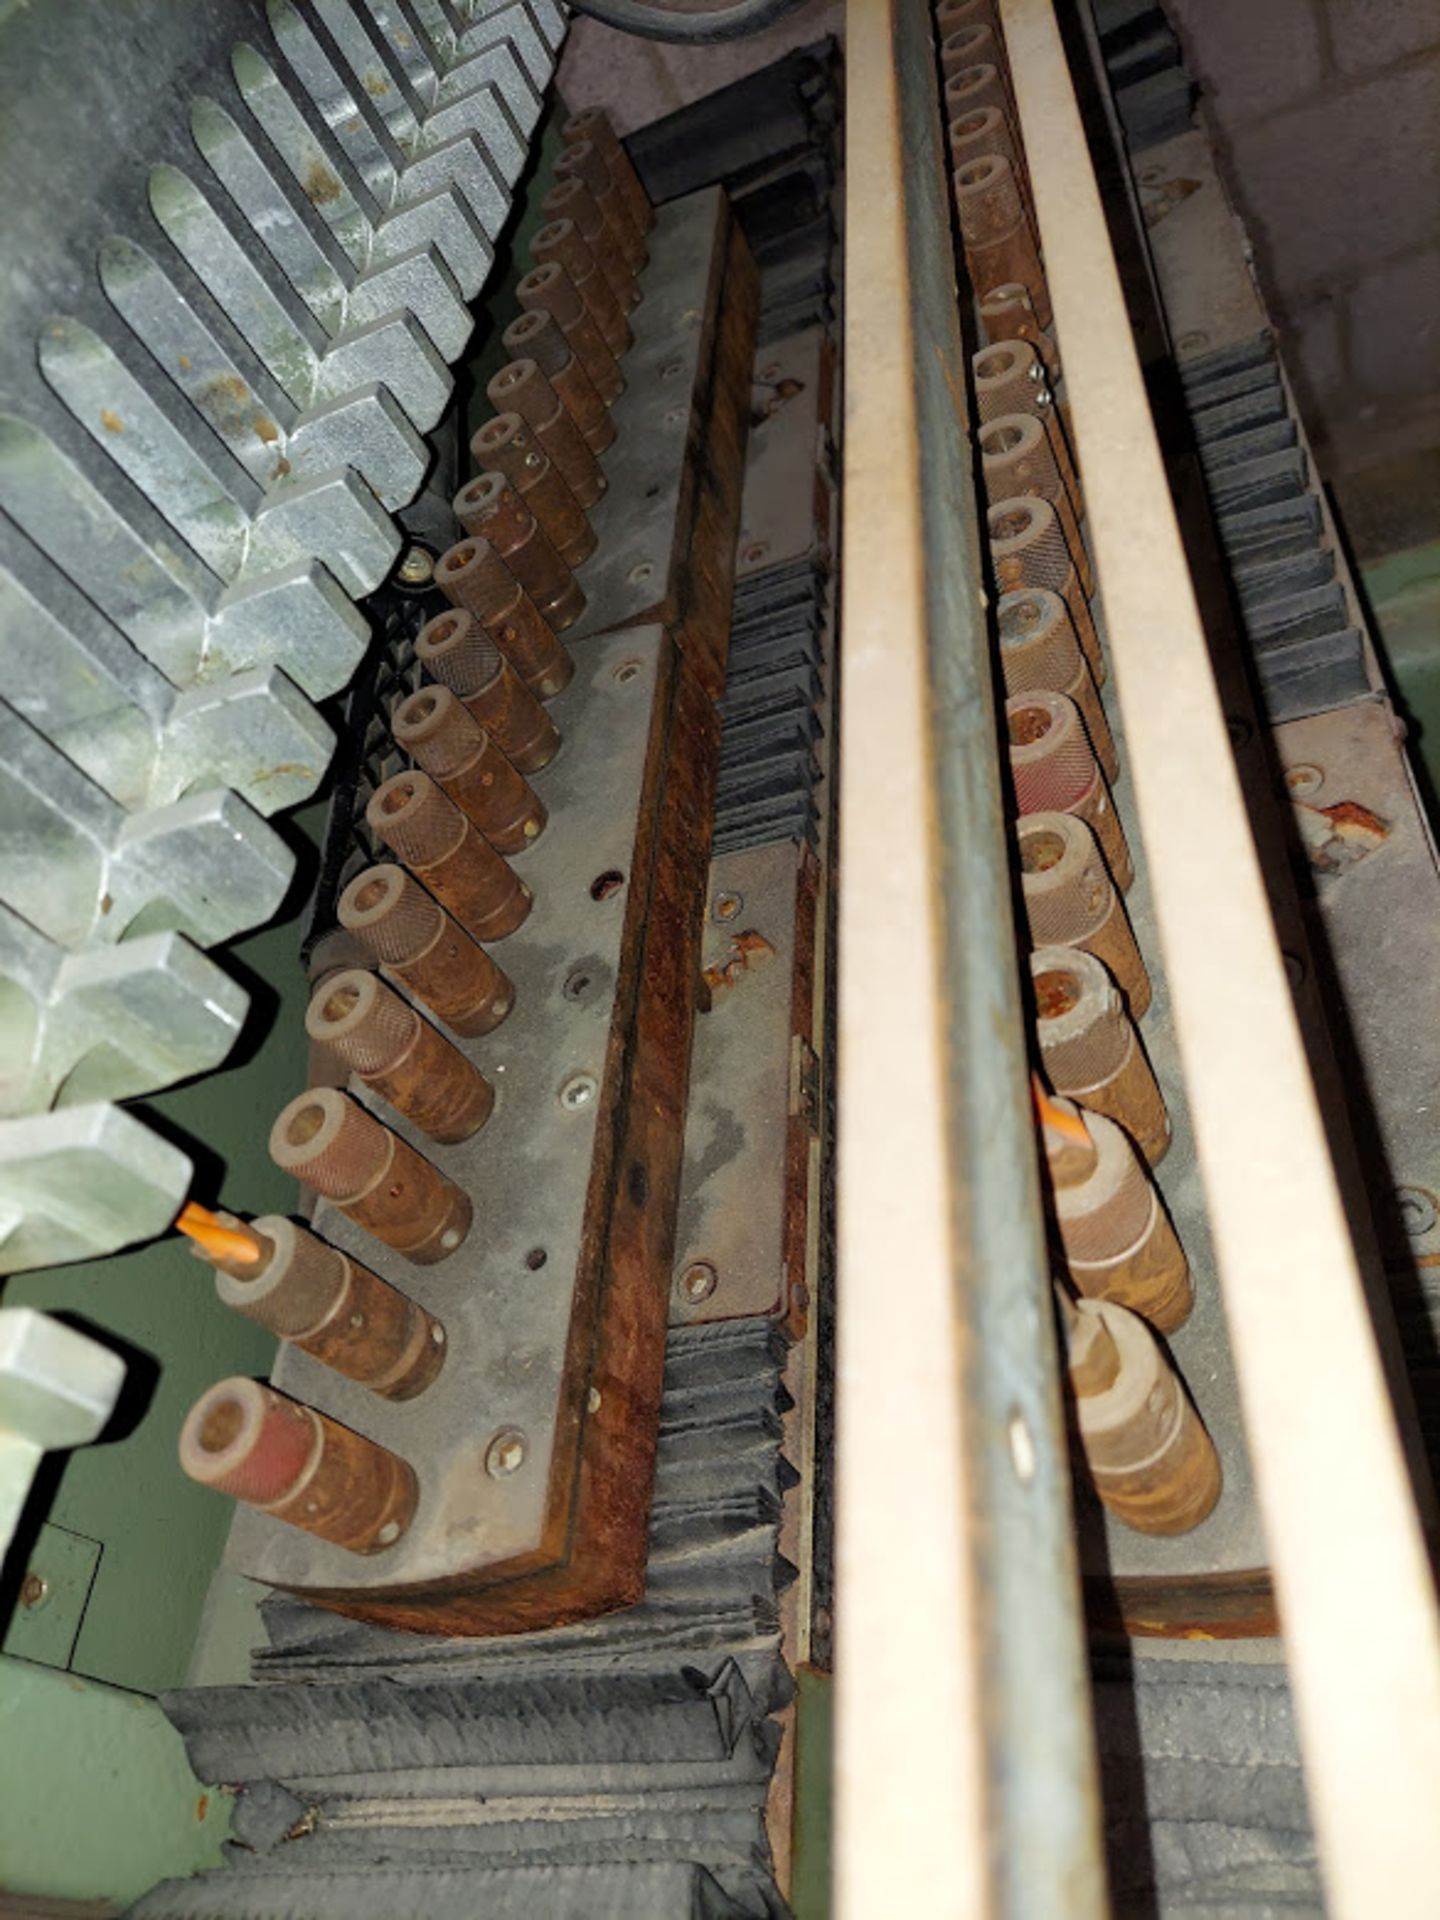 Zangheri & Boschetti Mulit Mat P3 Line Boring Machine, Model #MP3, 1 - 21 Spindle Horizontal Drill - Image 2 of 7